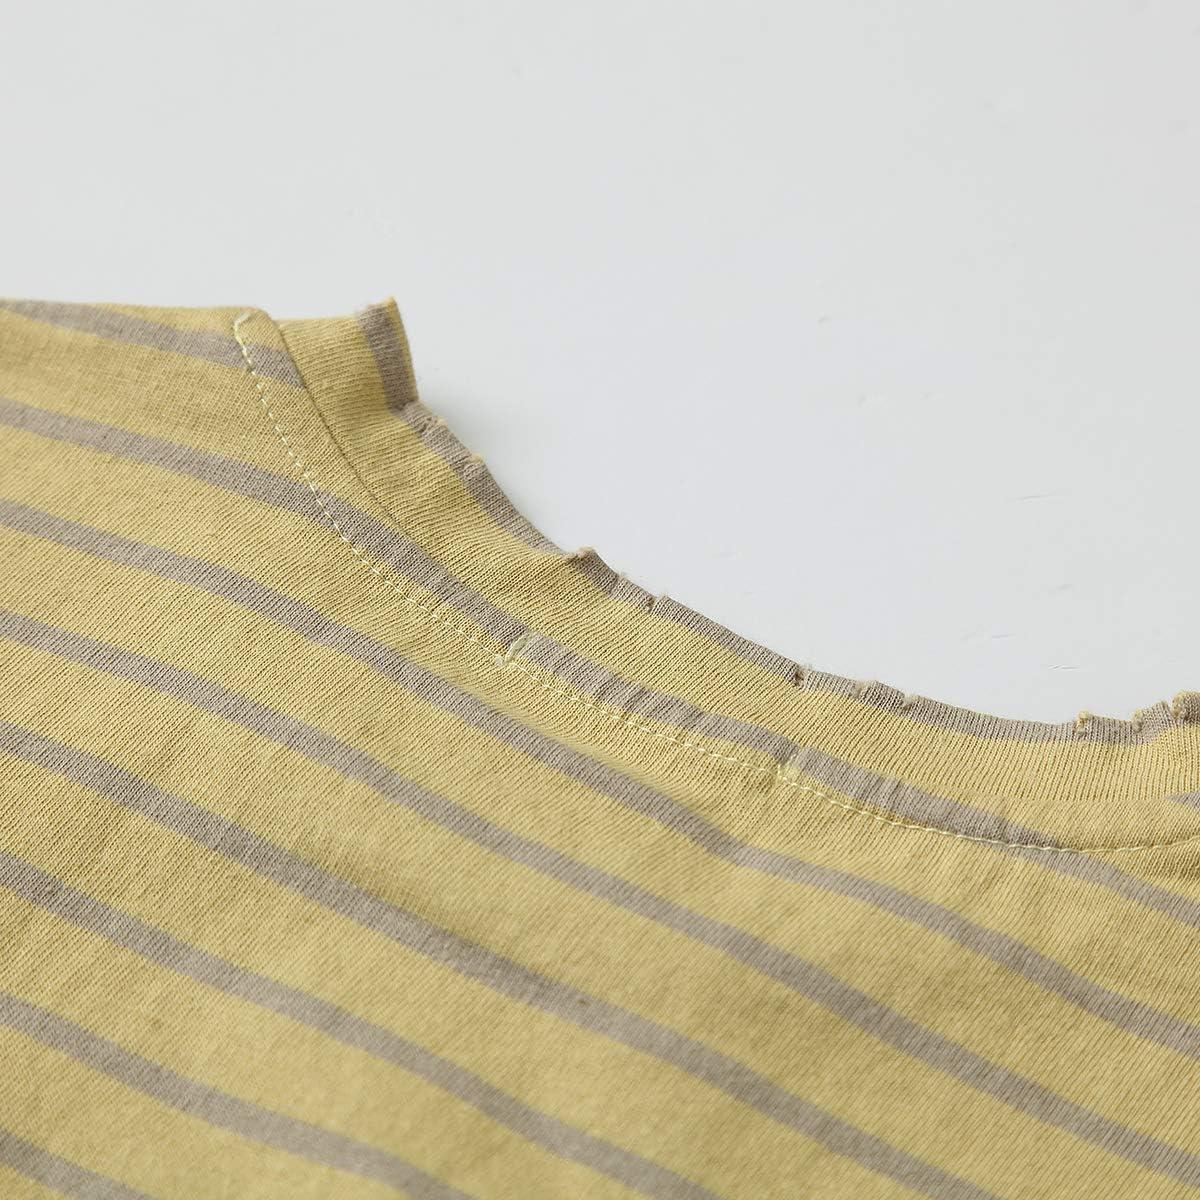 Mason Island Toddler Kids Boys'Tshirt Short Sleeve T-Shirts Girls' Summer Tee